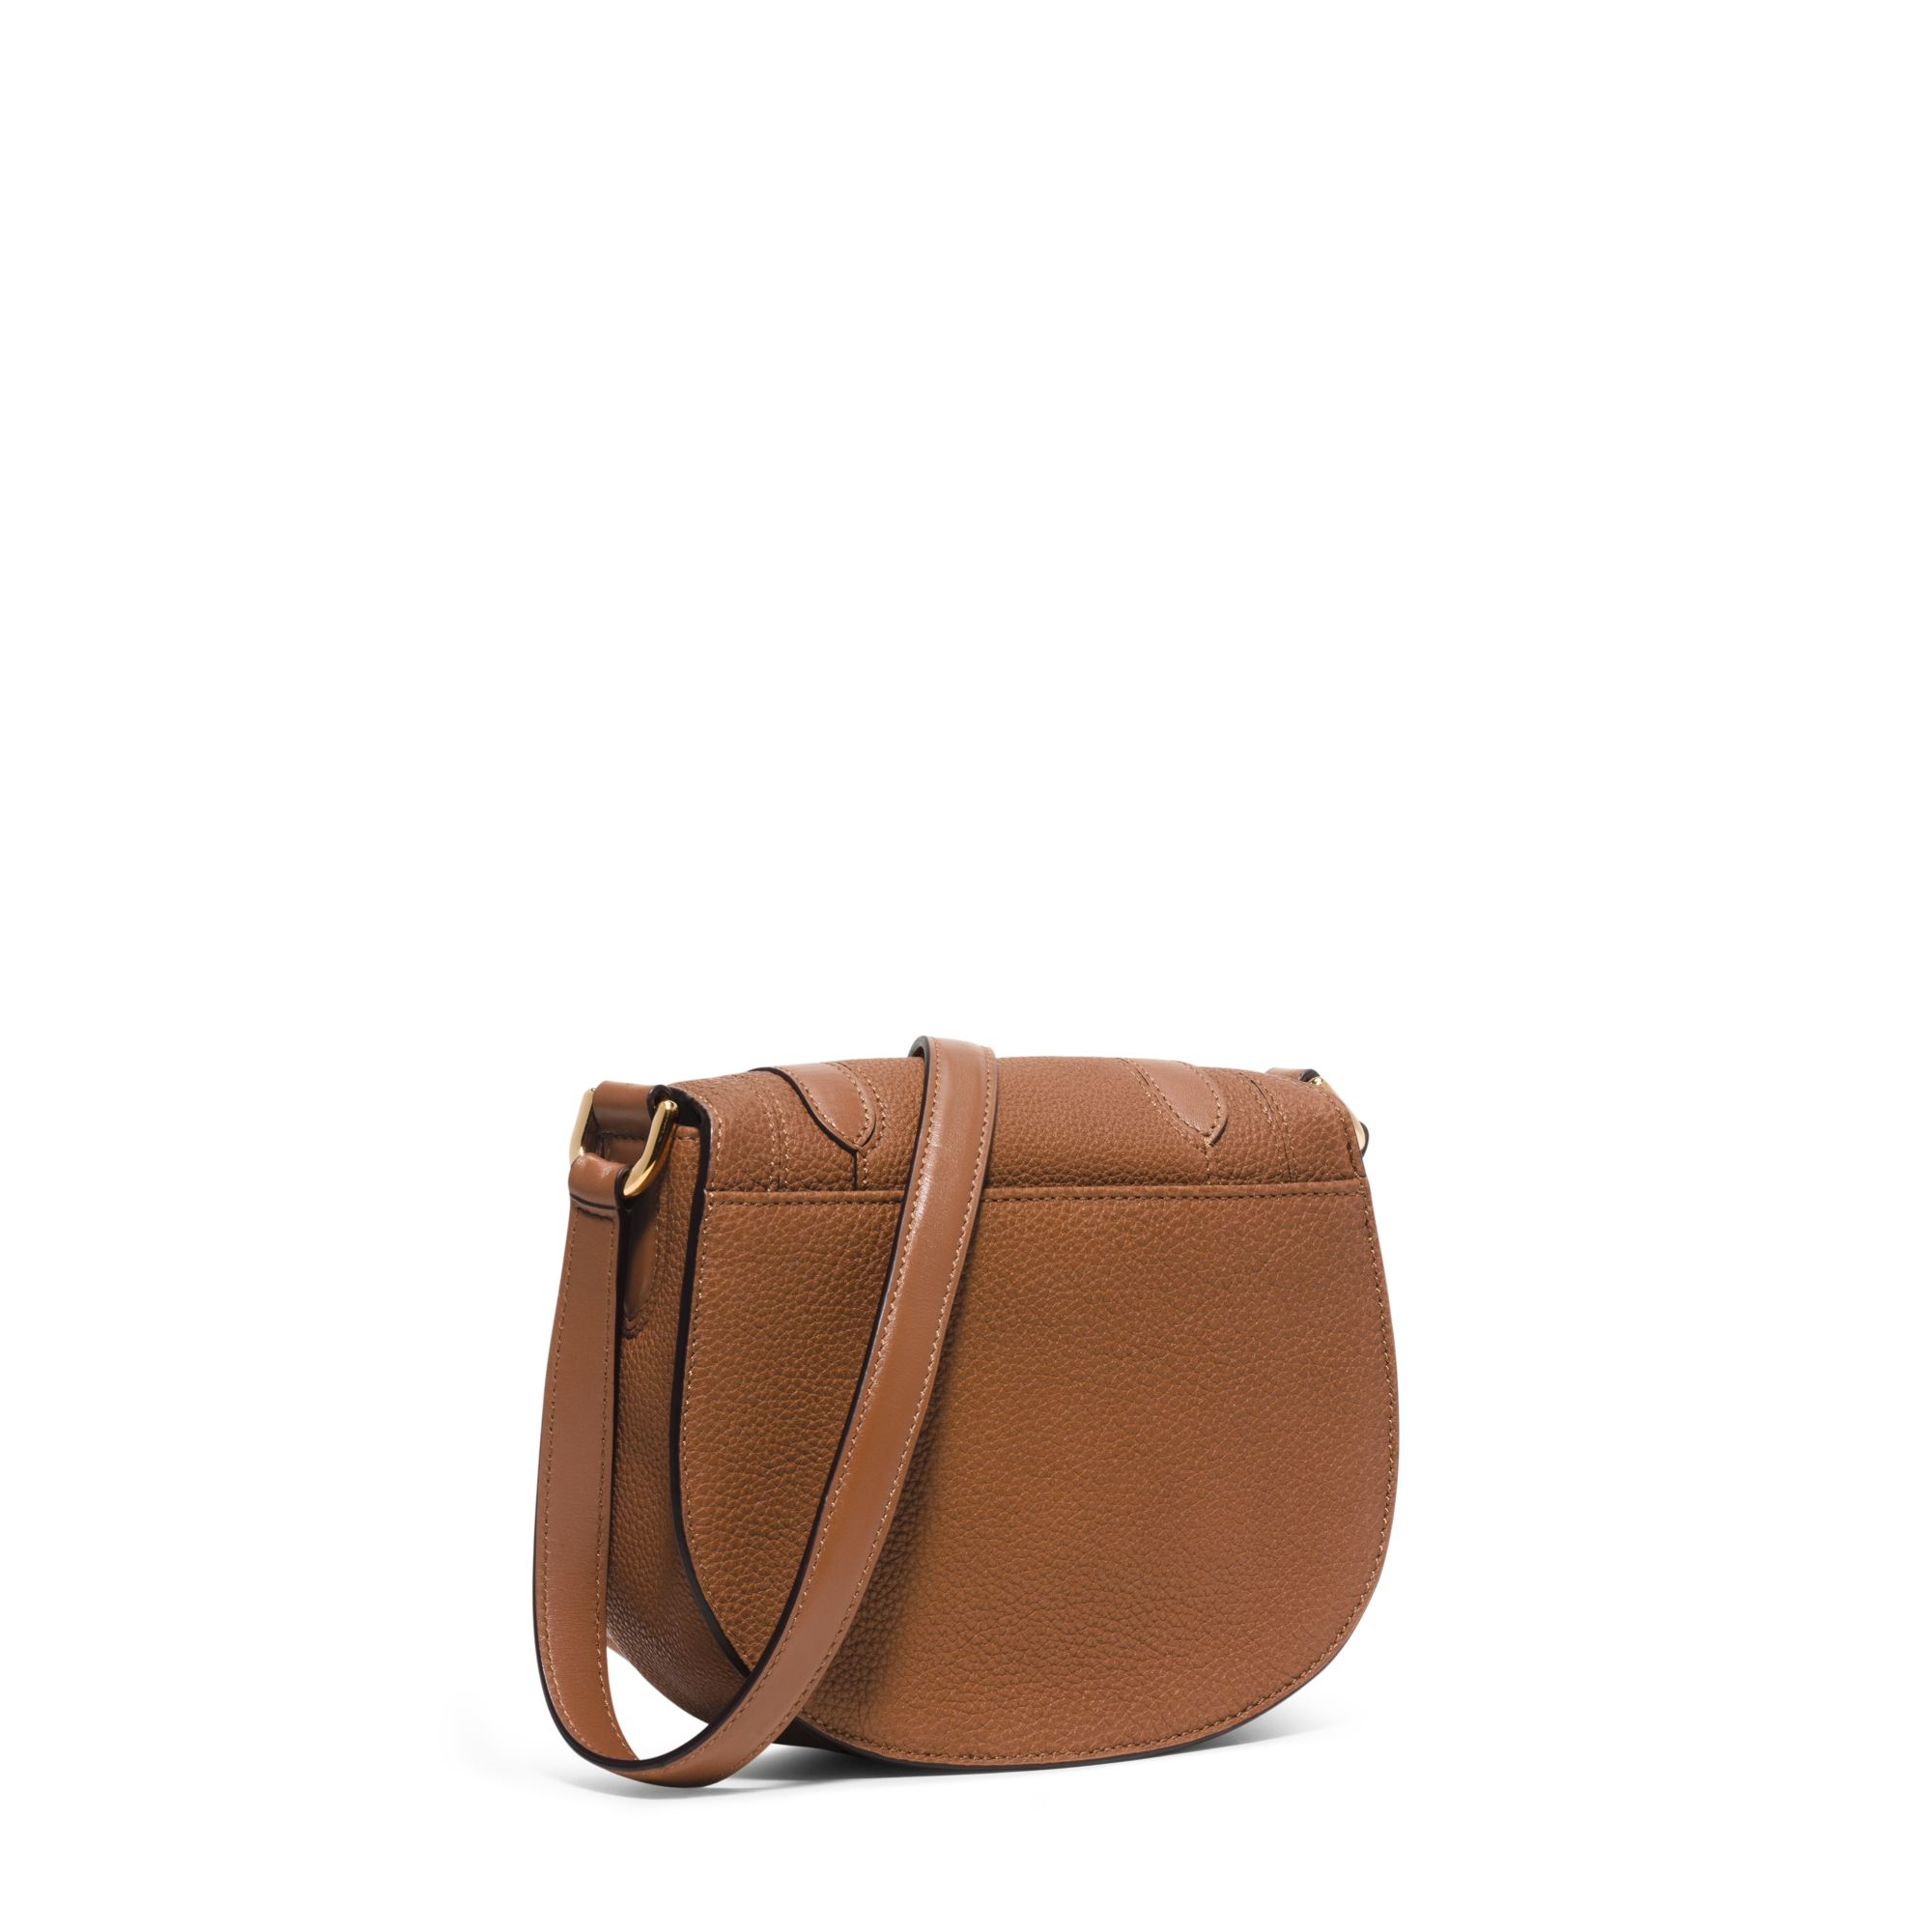 5b2639571980 Lyst - Michael Kors Skorpios Small Leather Crossbody in Brown